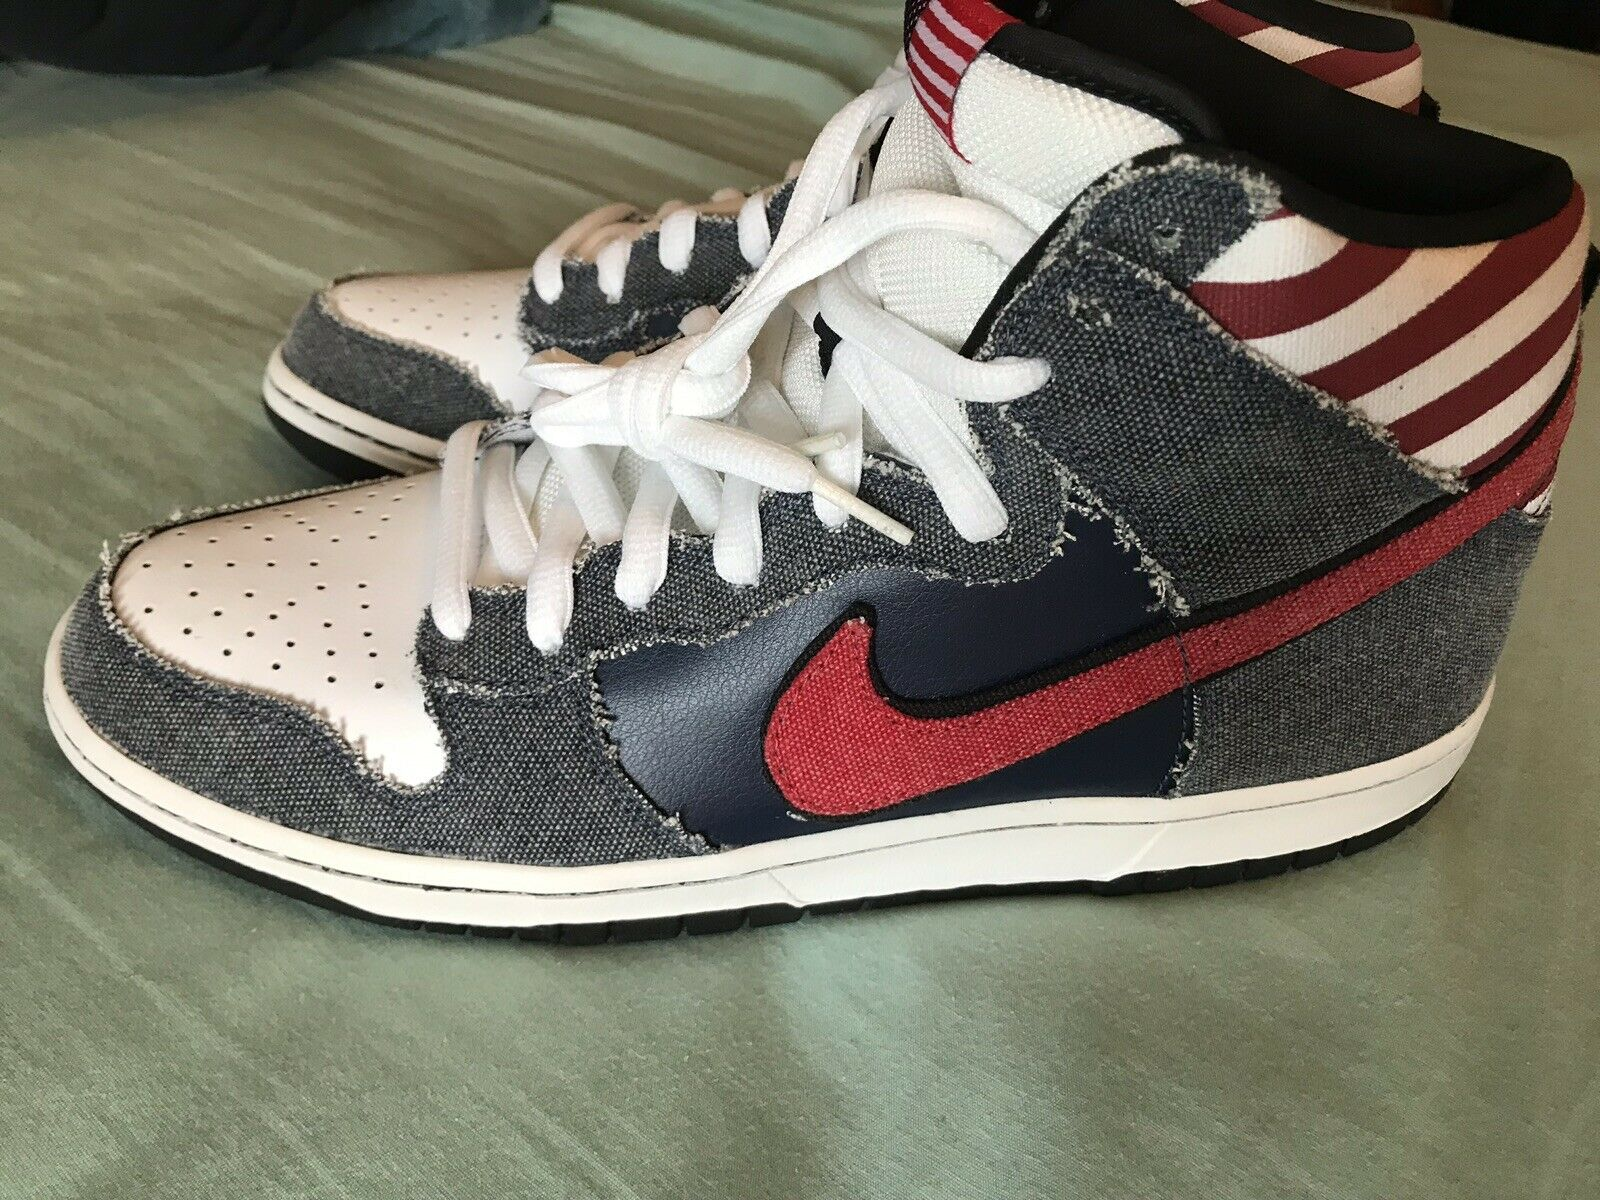 Nike SB Dunk High Born in the USA Size 12